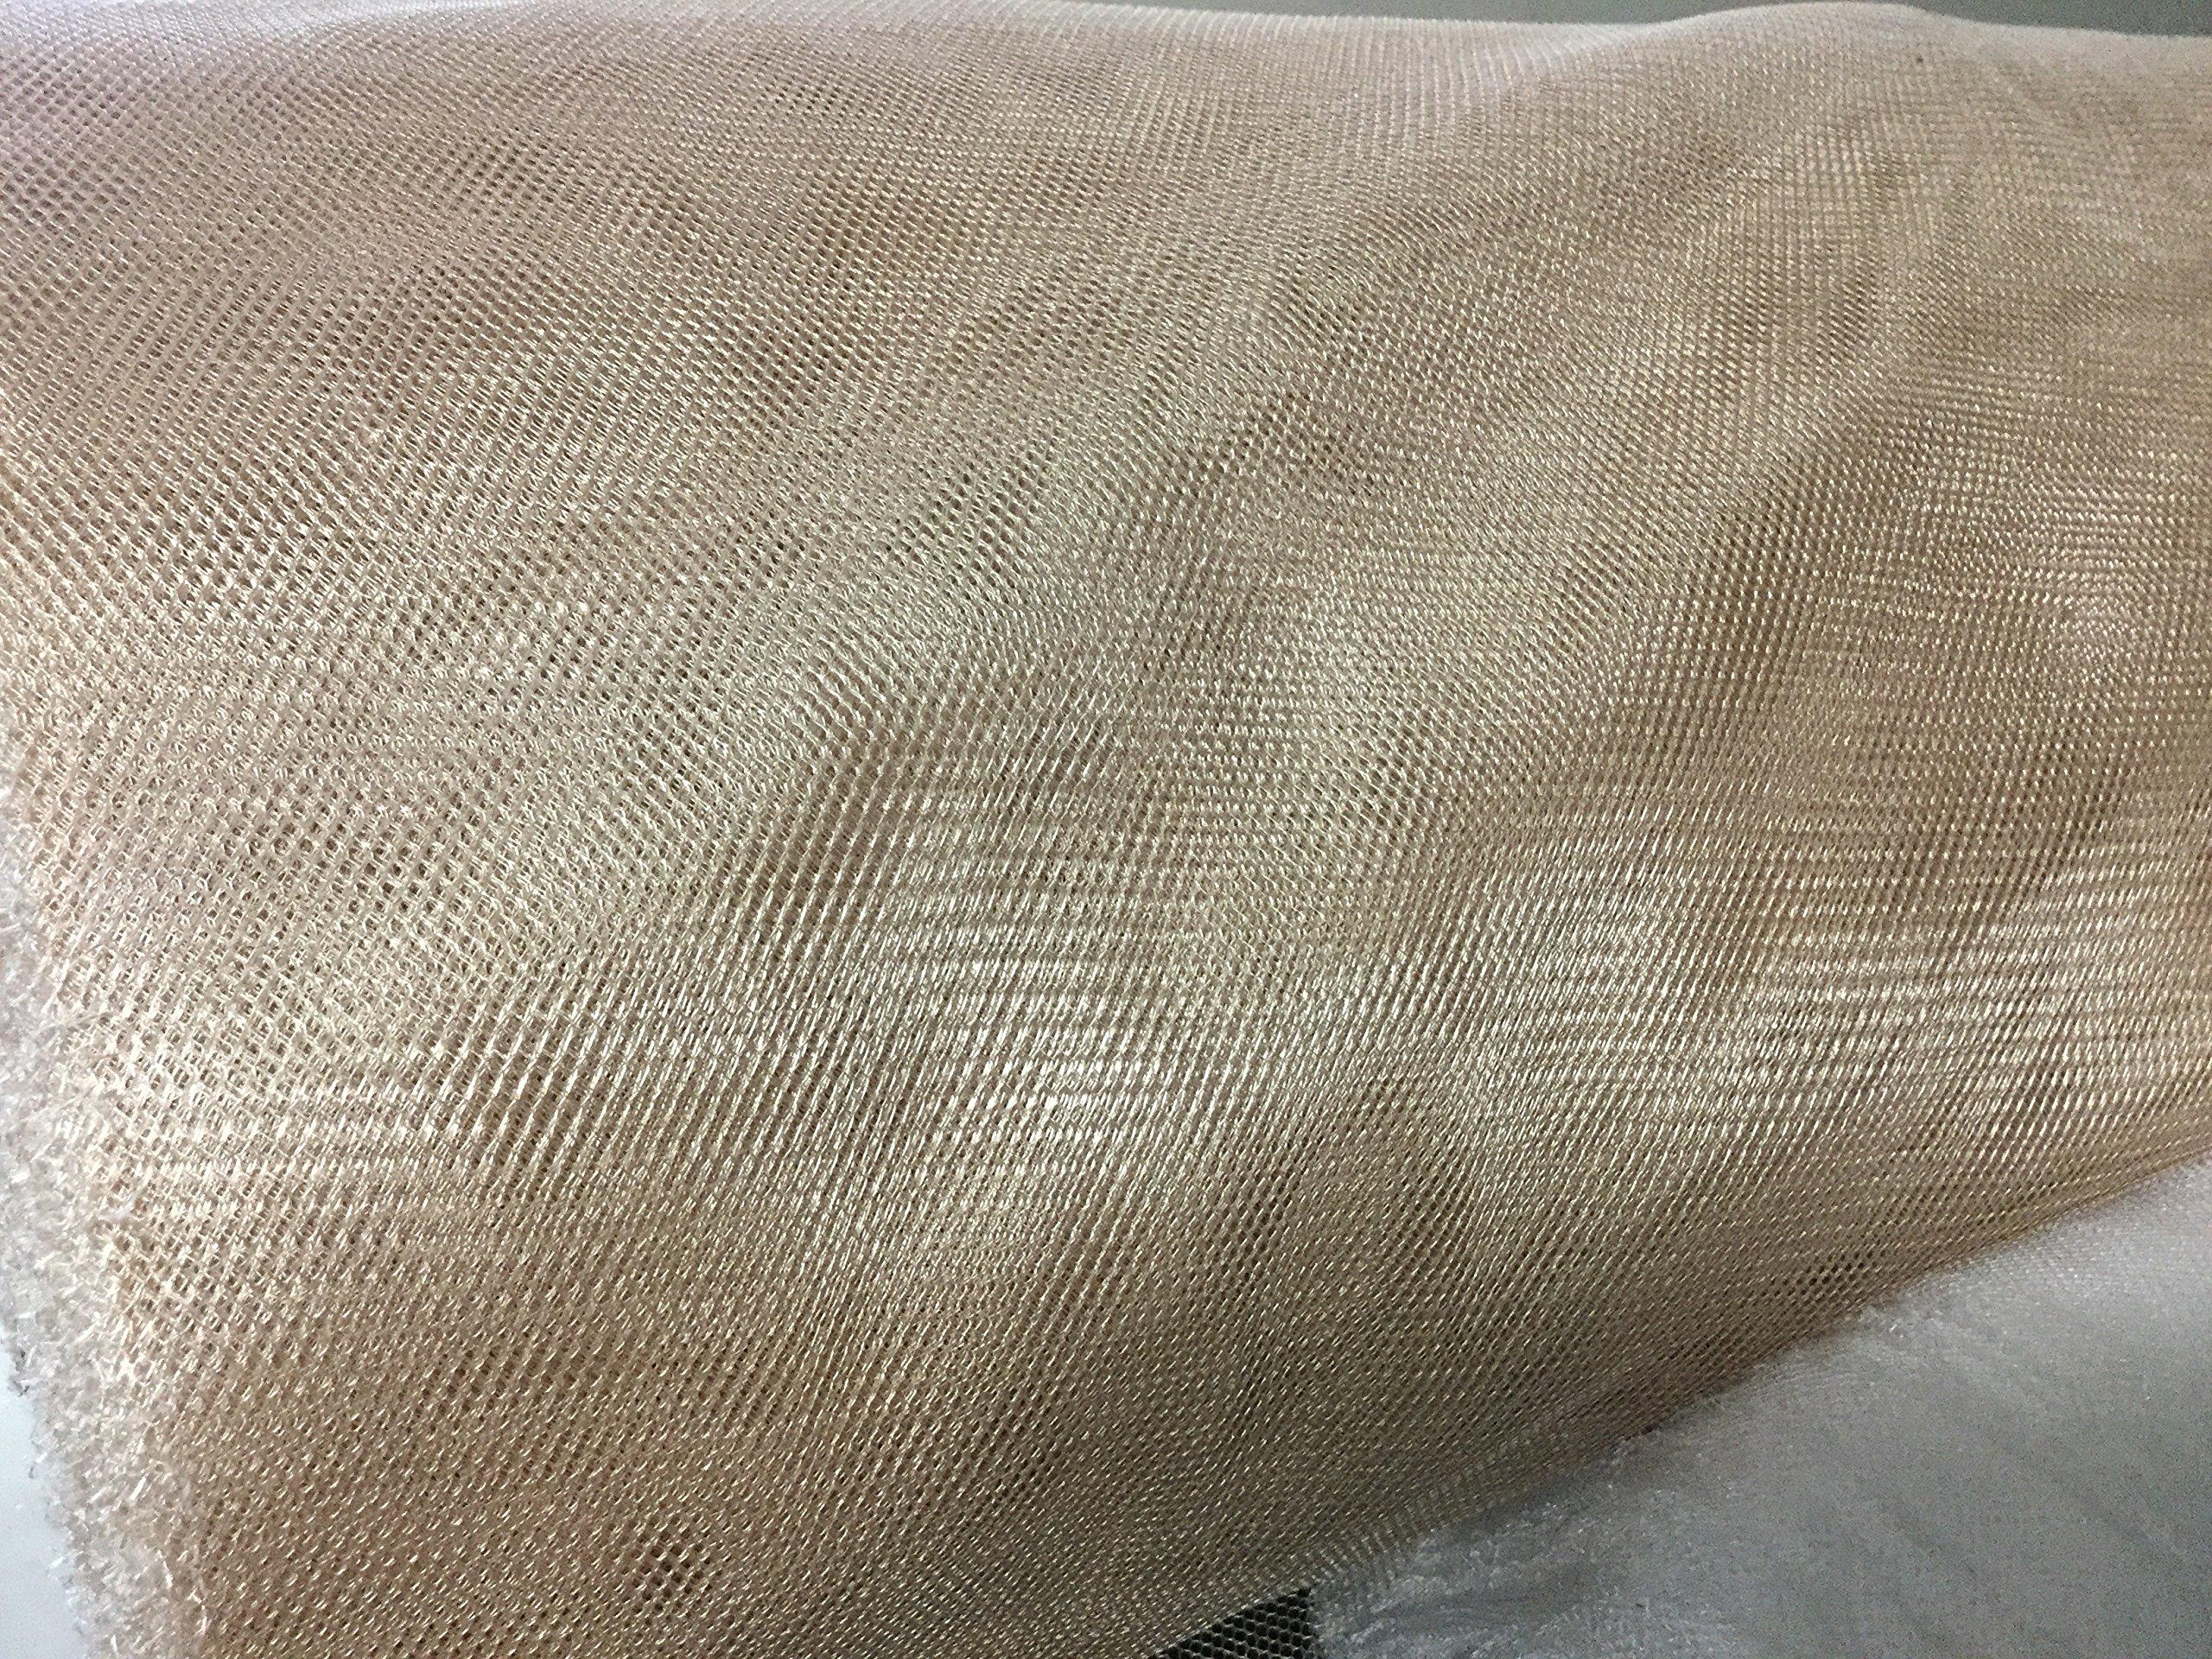 Mosquito Netting By Skeeta 66'' Wide X 5 Yards - Antique beige